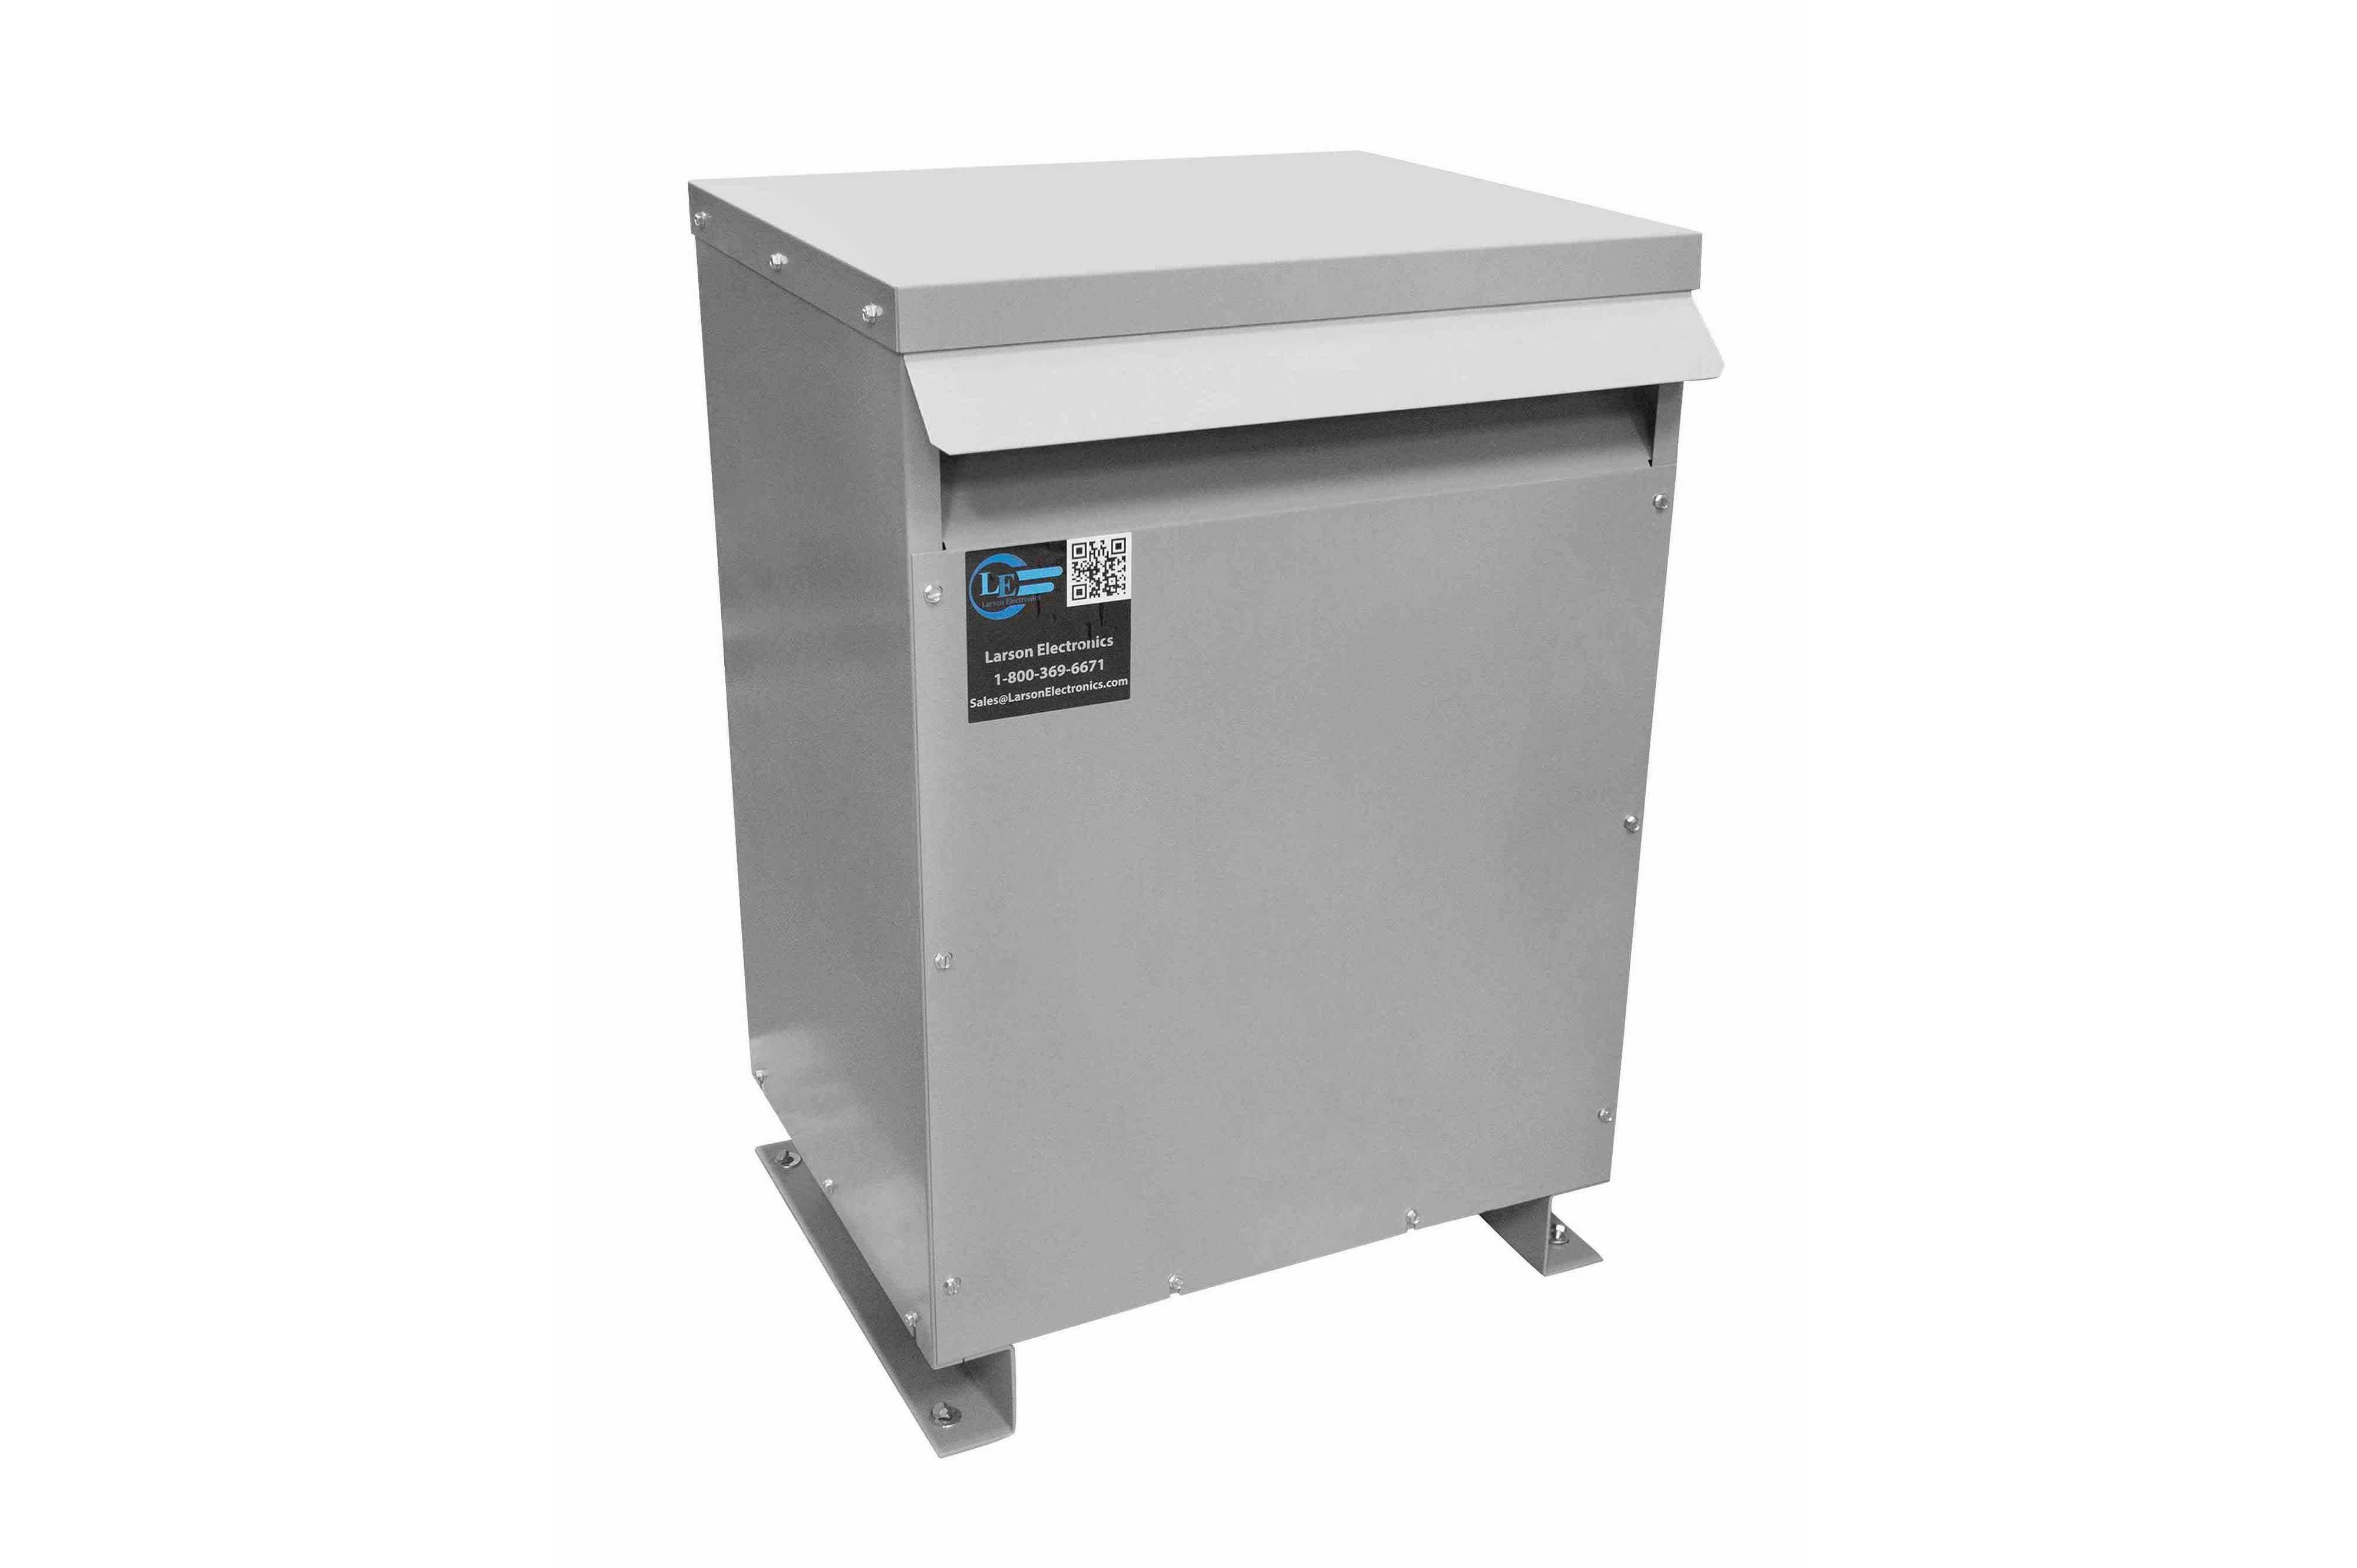 112.5 kVA 3PH Isolation Transformer, 600V Wye Primary, 240V/120 Delta Secondary, N3R, Ventilated, 60 Hz